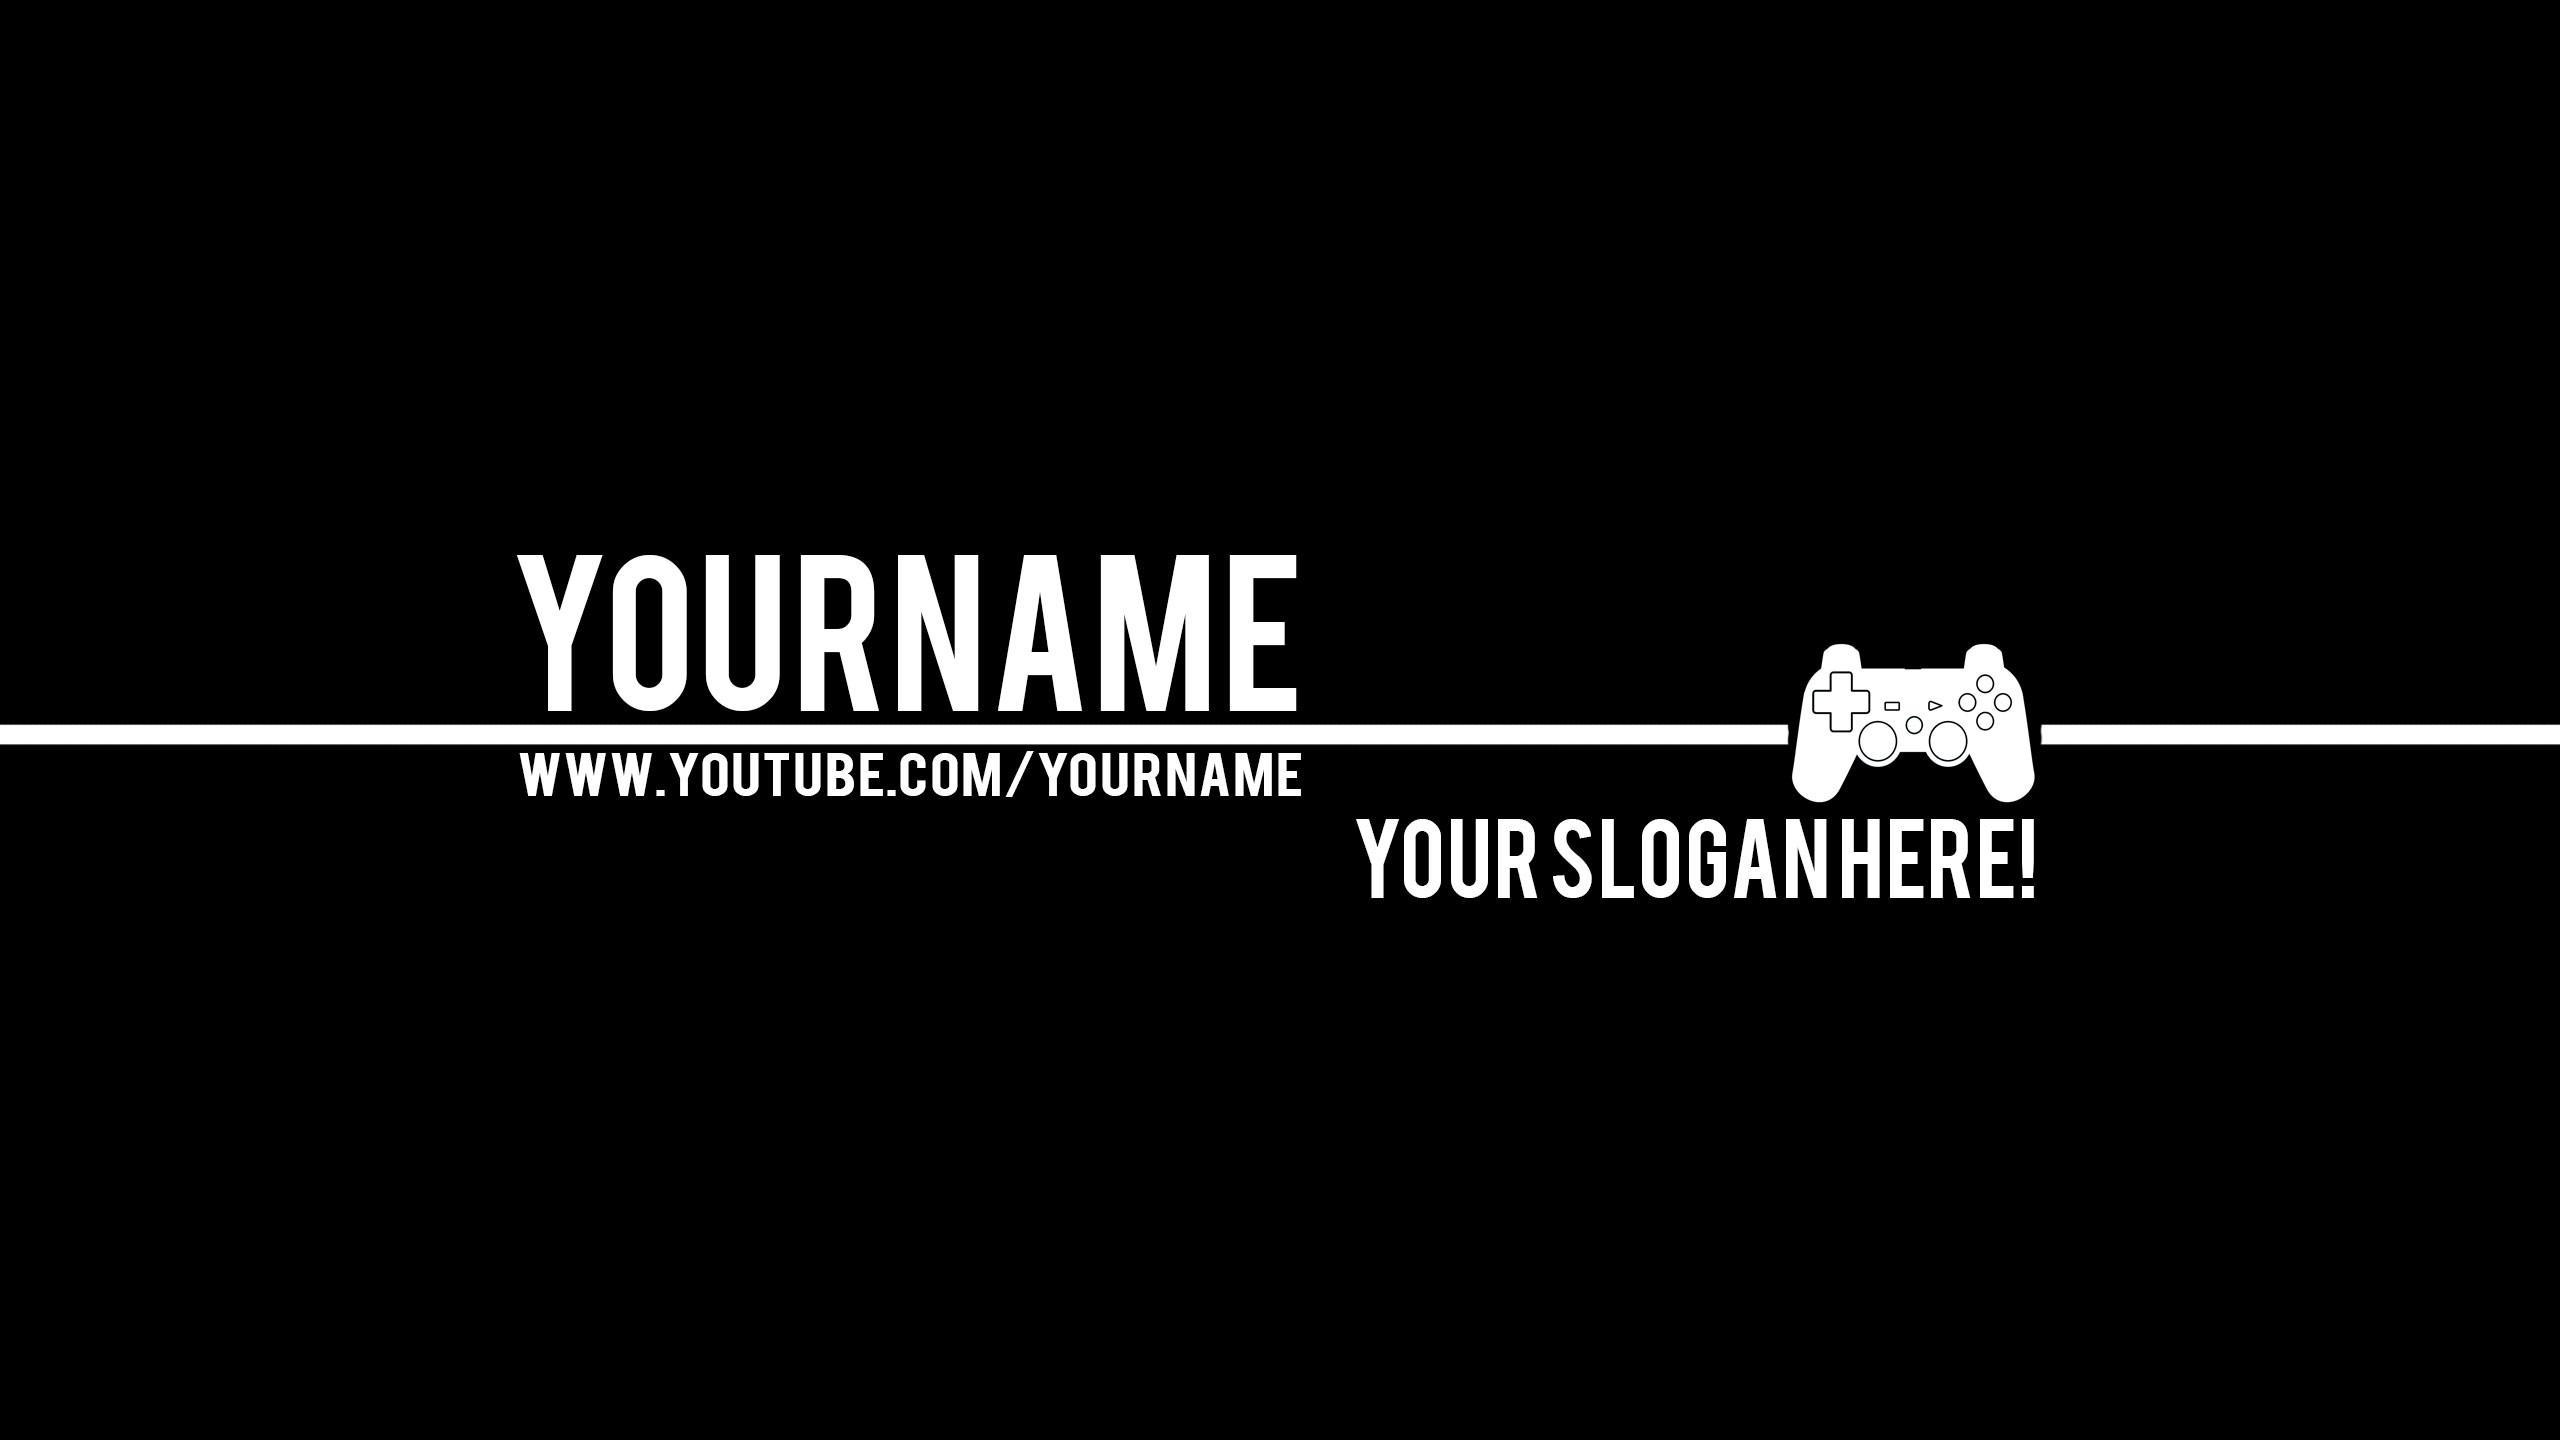 banners 2015 2016 bulbasuer # controller # gaming youtube banner .